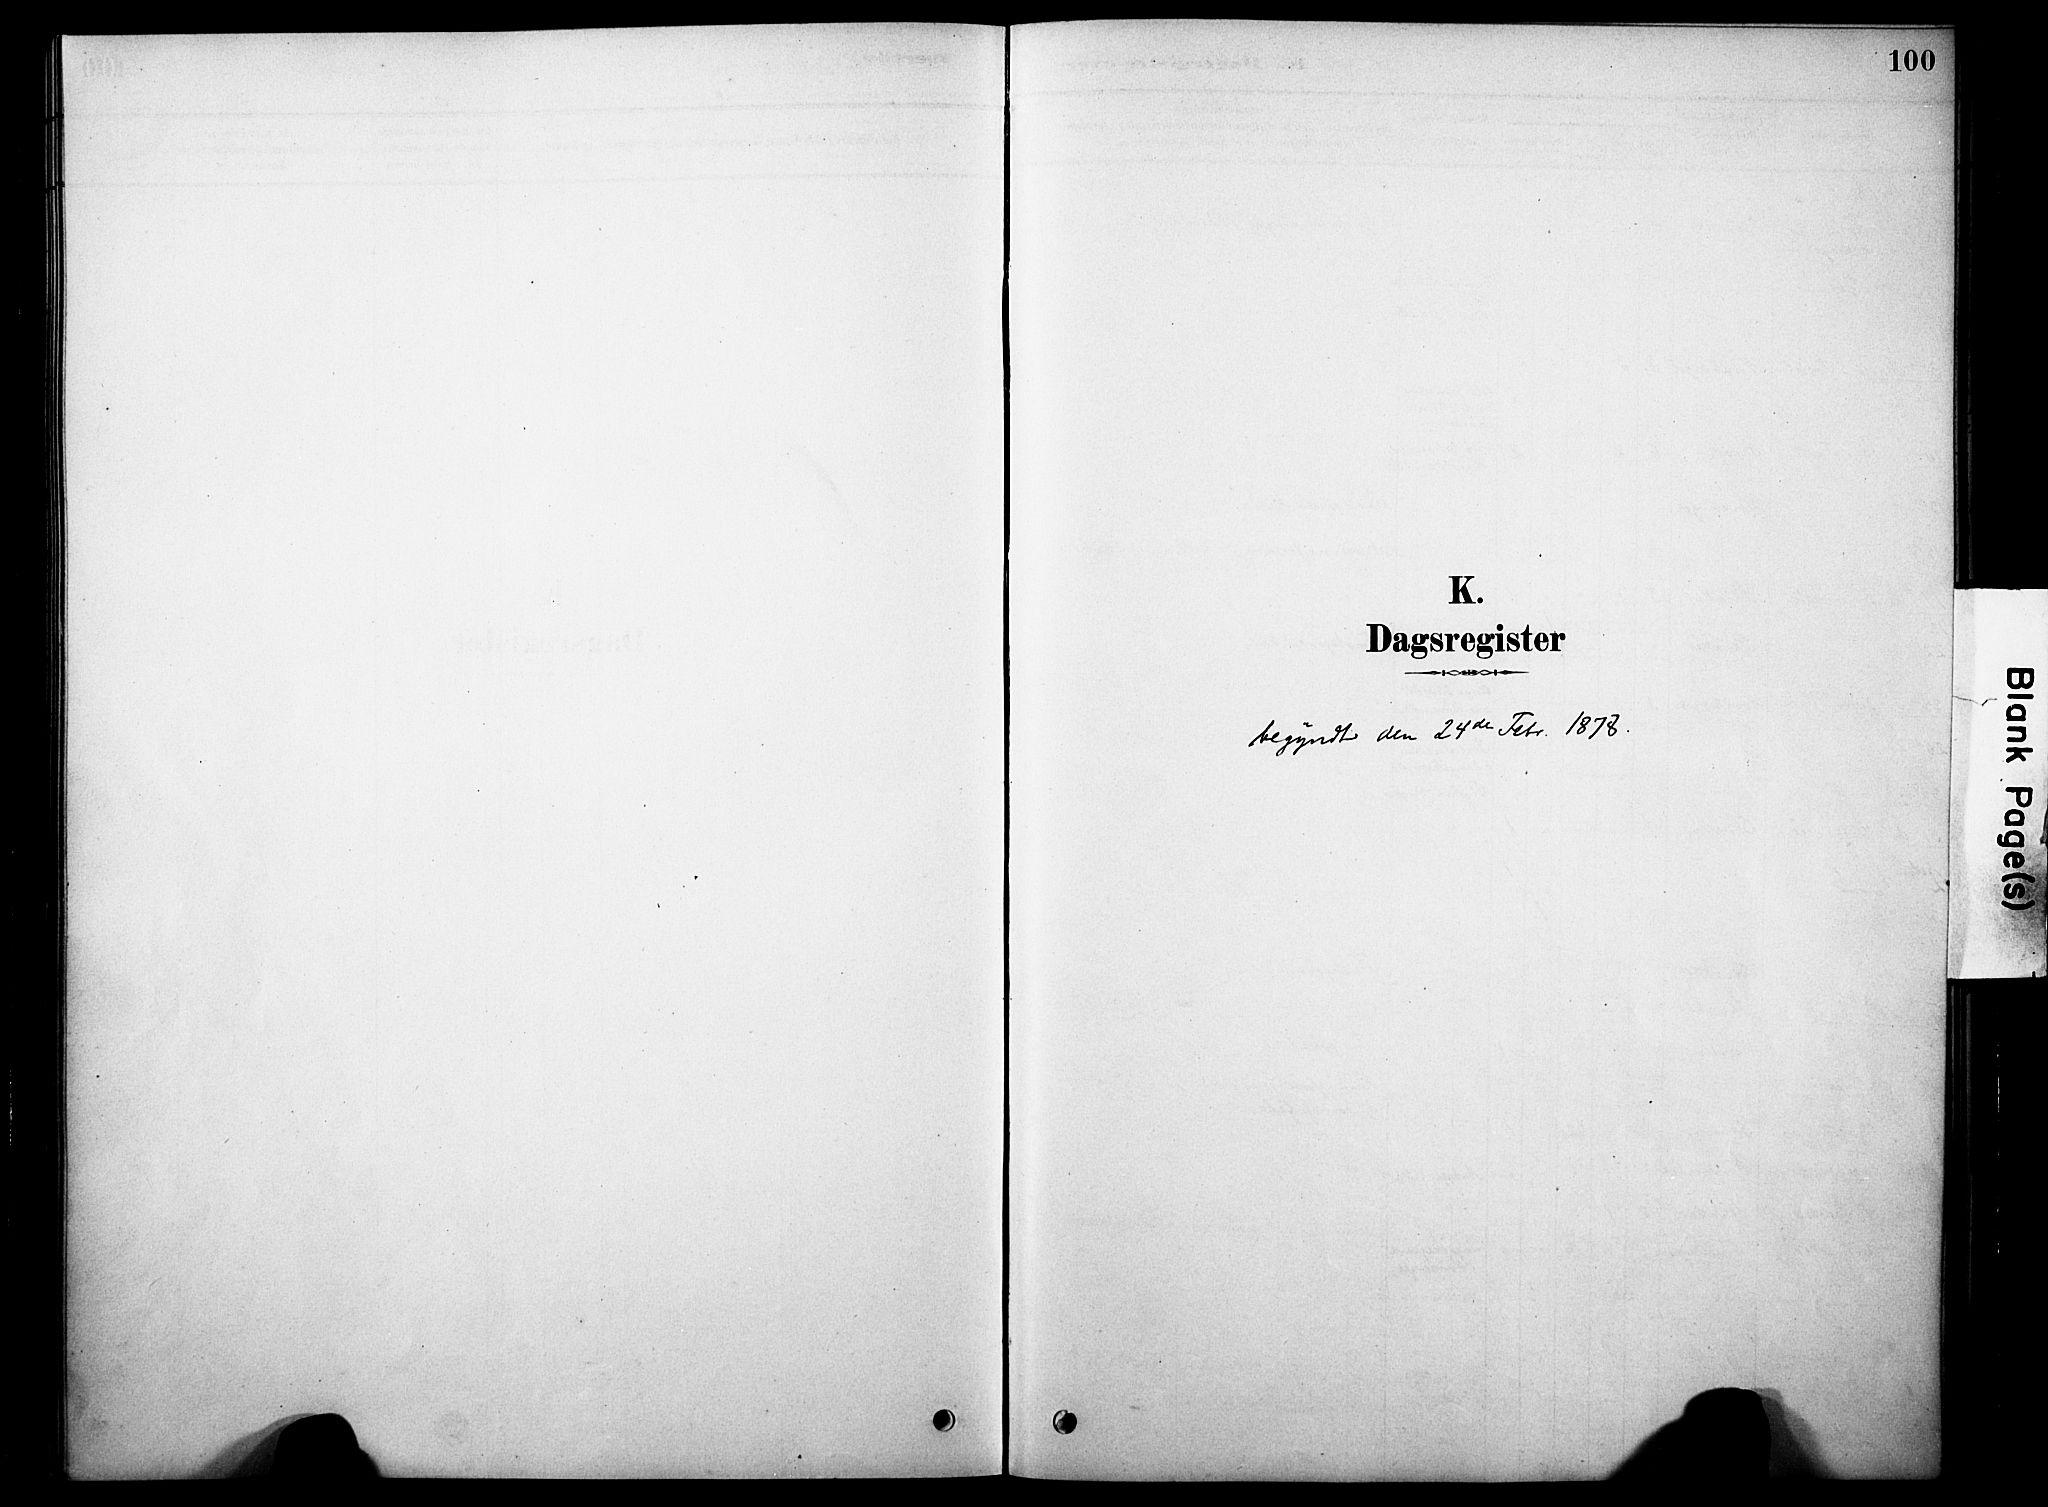 SAH, Skjåk prestekontor, Ministerialbok nr. 2, 1878-1907, s. 100